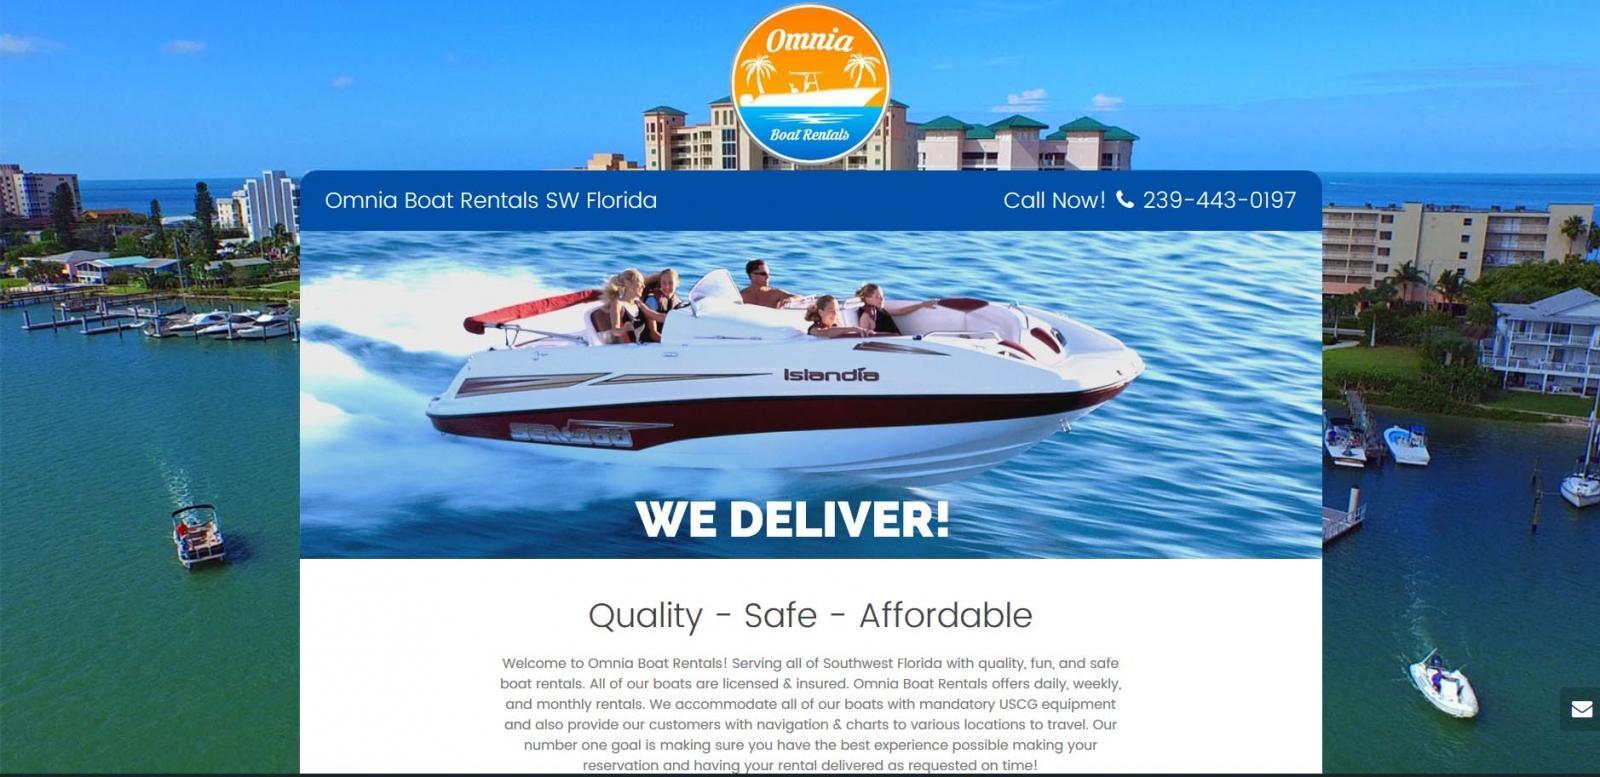 omnia-boat-rental.jpg